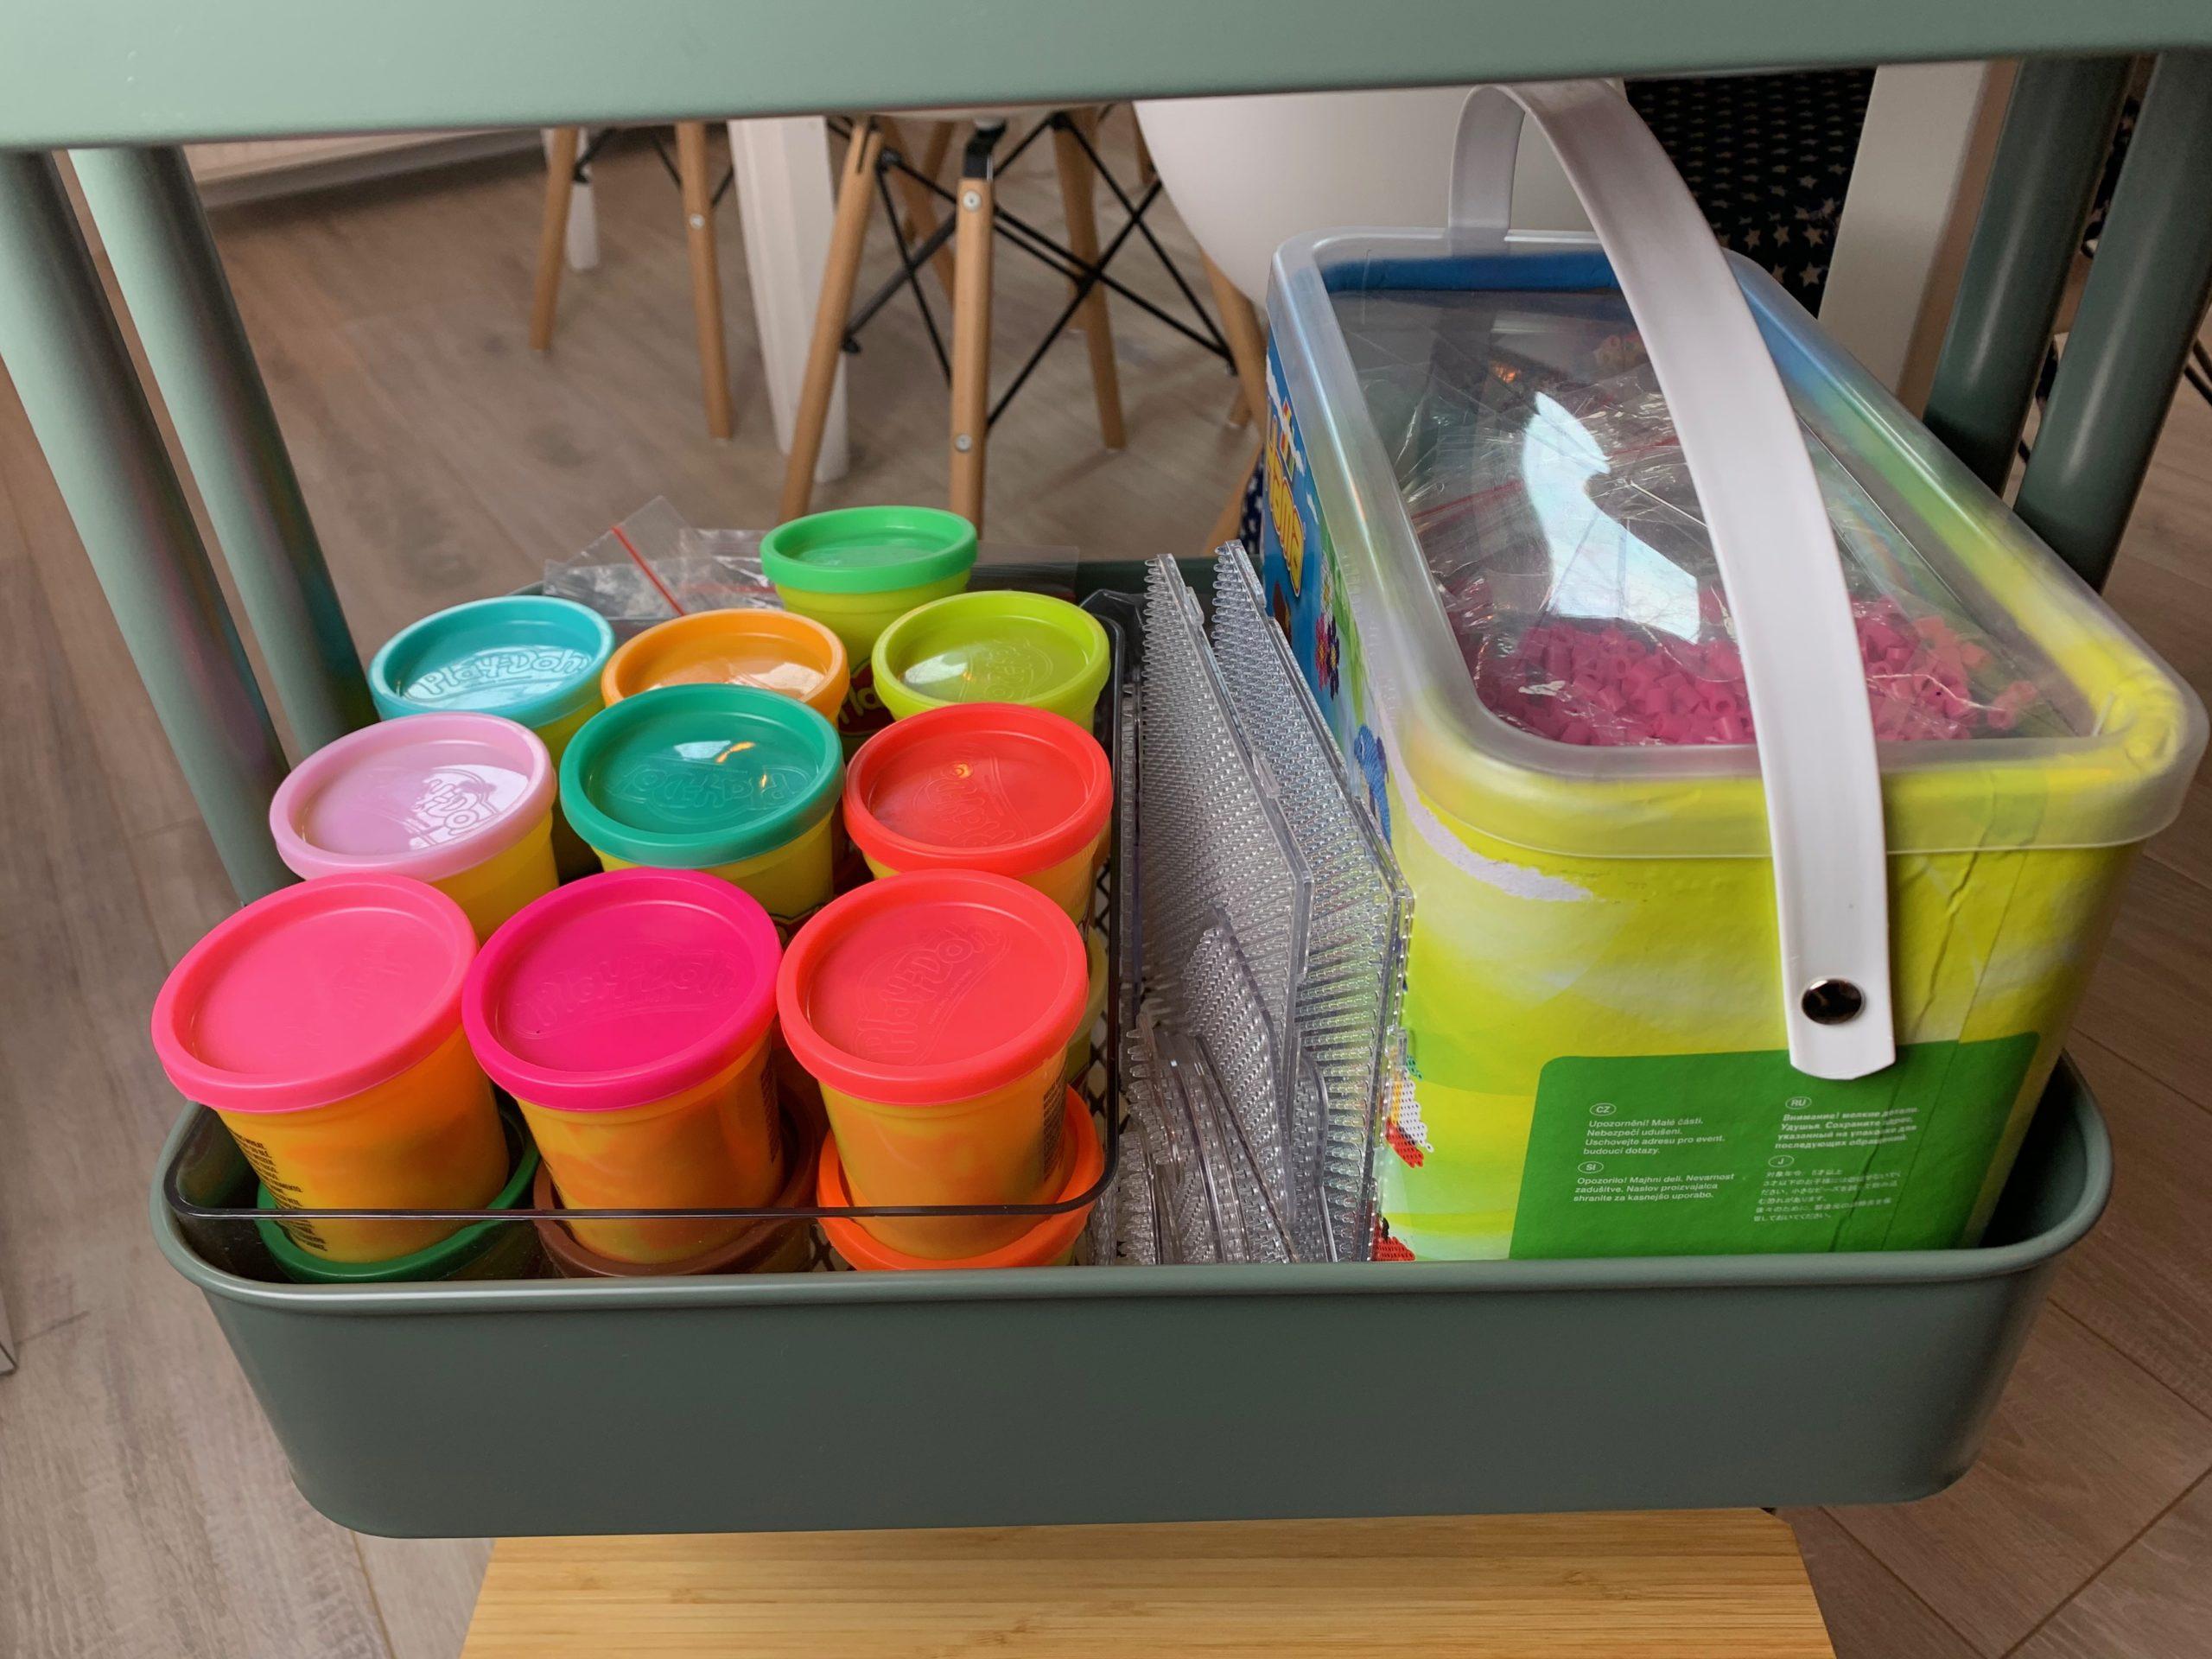 Bügelperlen sortieren, Knete organisieren, Bastelwagen, Bastelmaterial organisieren